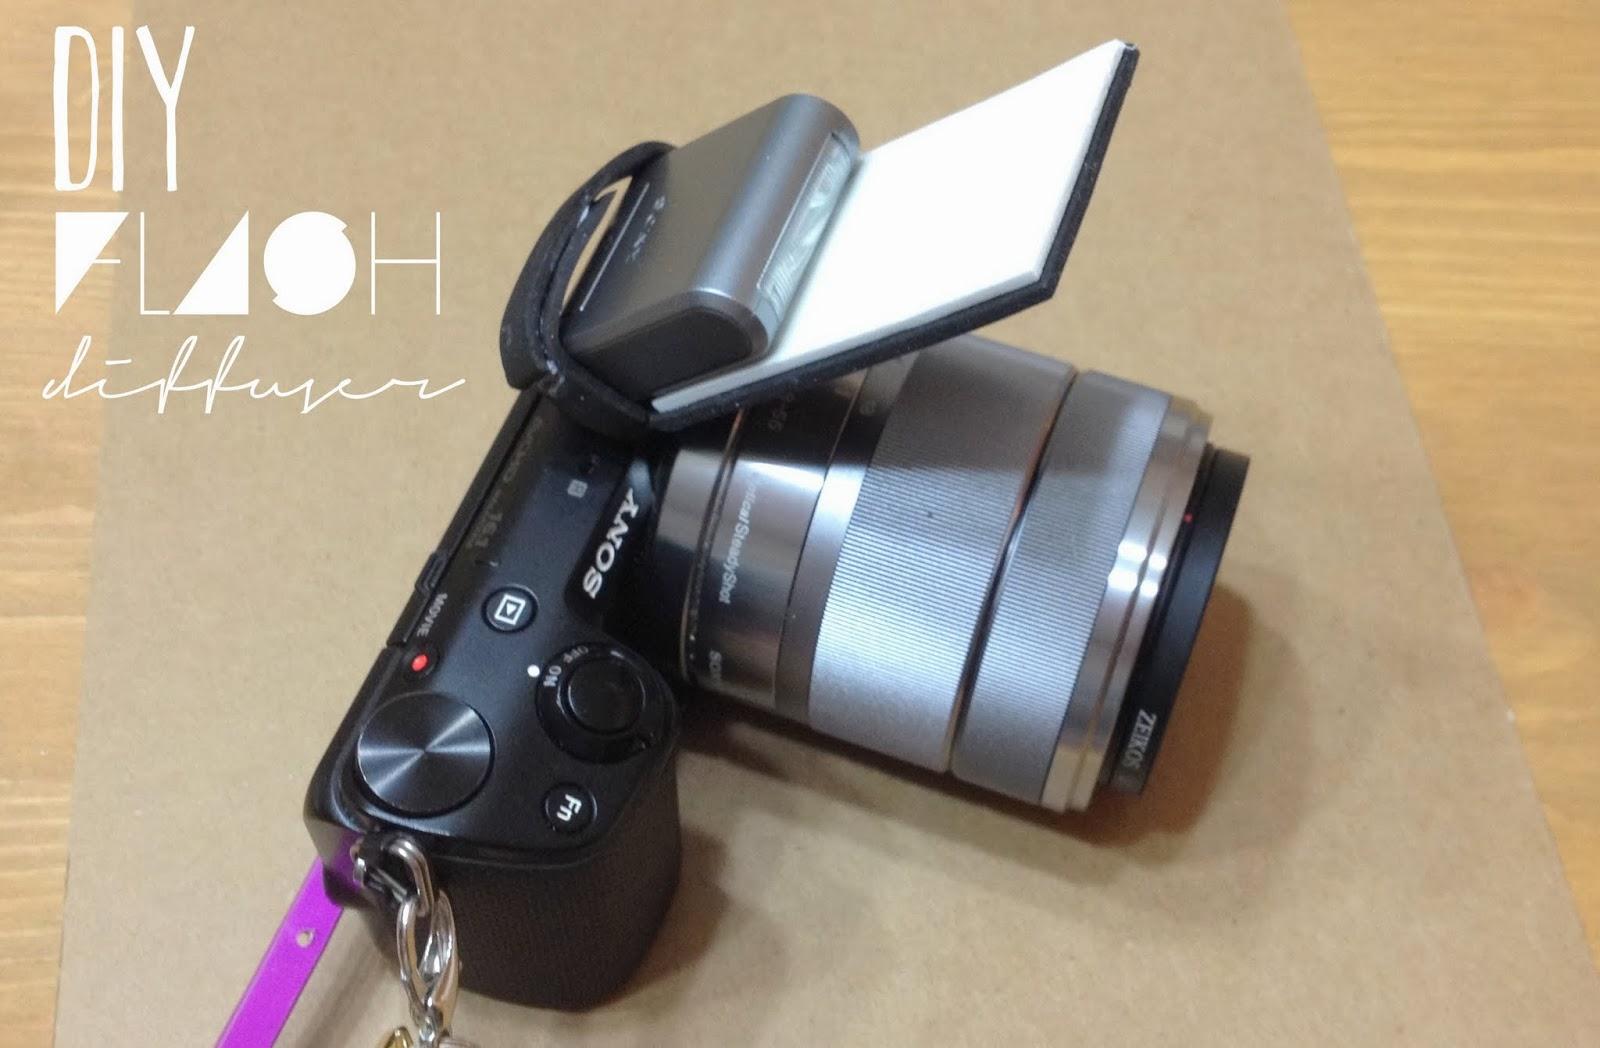 DIY Flash Diffuser (Sony NEX 5)